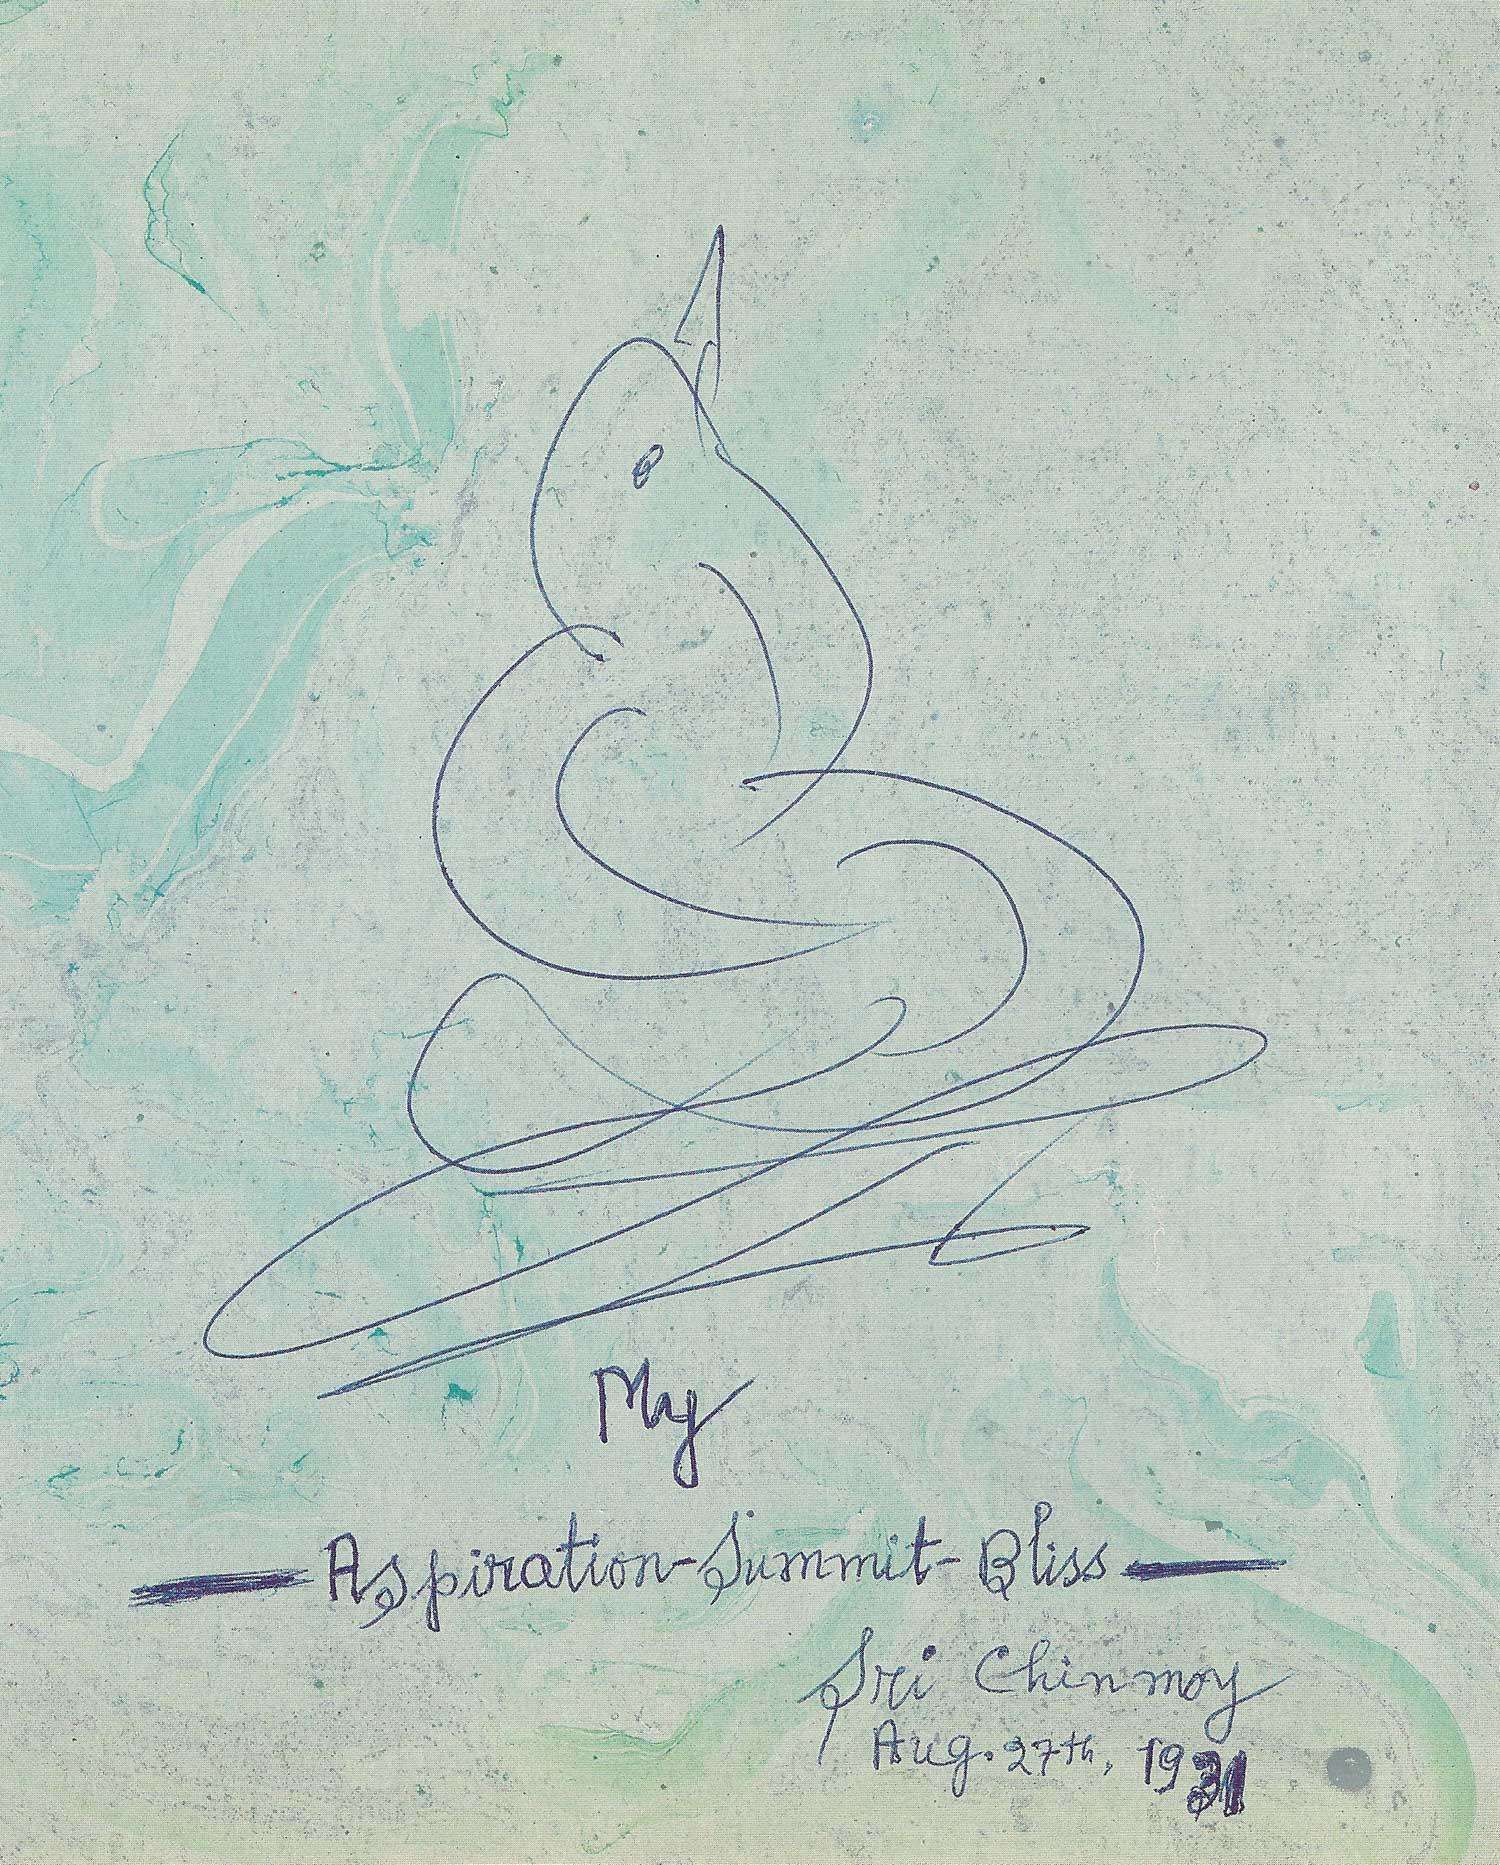 My-Aspiration-Summit-Bliss-Sri-Chinmoy